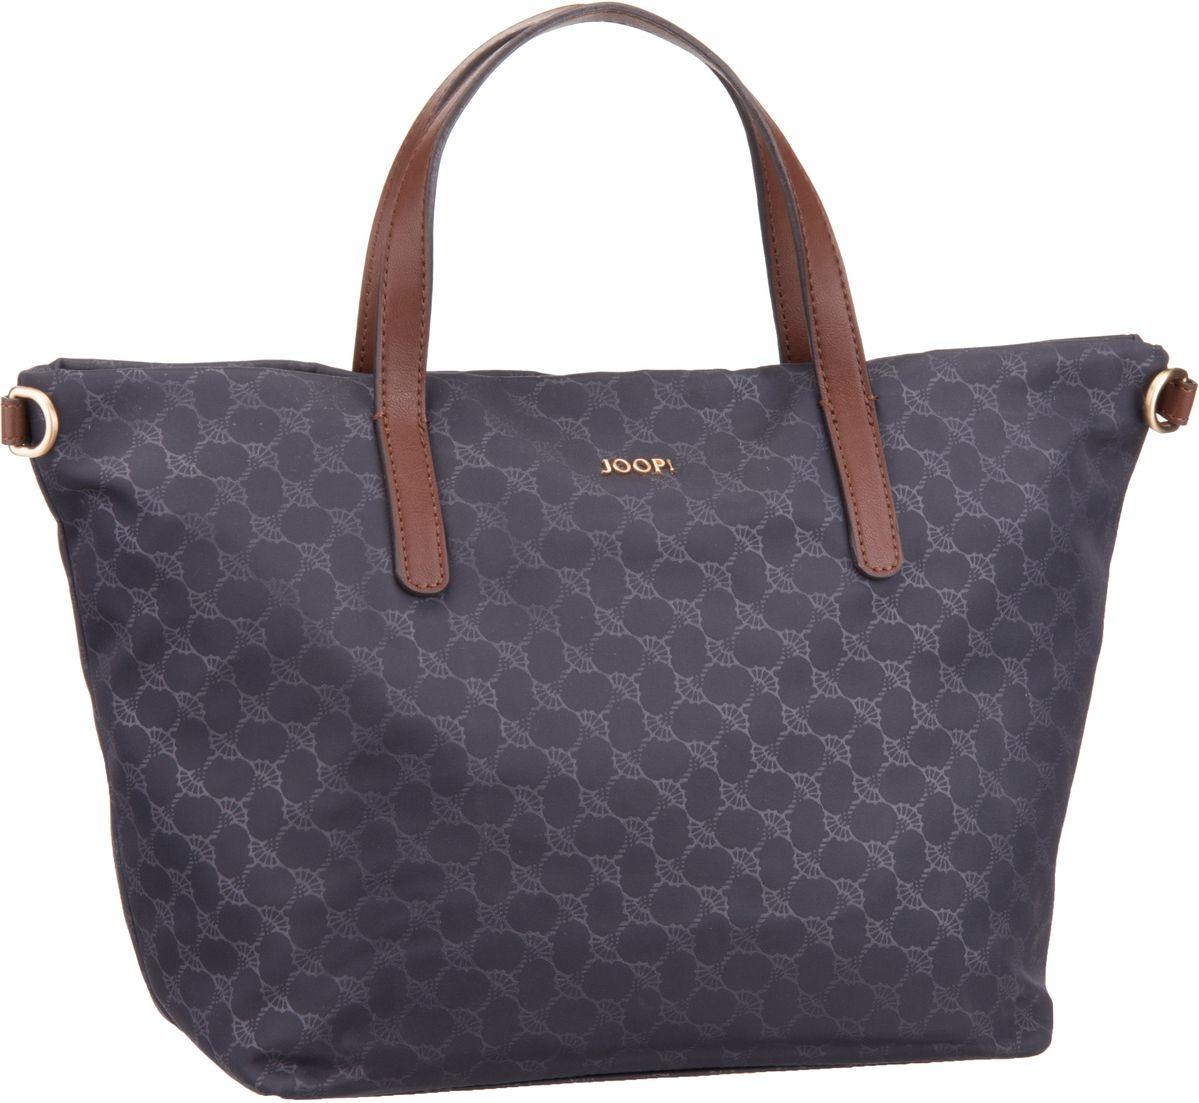 Joop Helena Nylon Cornflower Handbag Small Grey - Handtasche Sale Angebote Gastrose-Kerkwitz